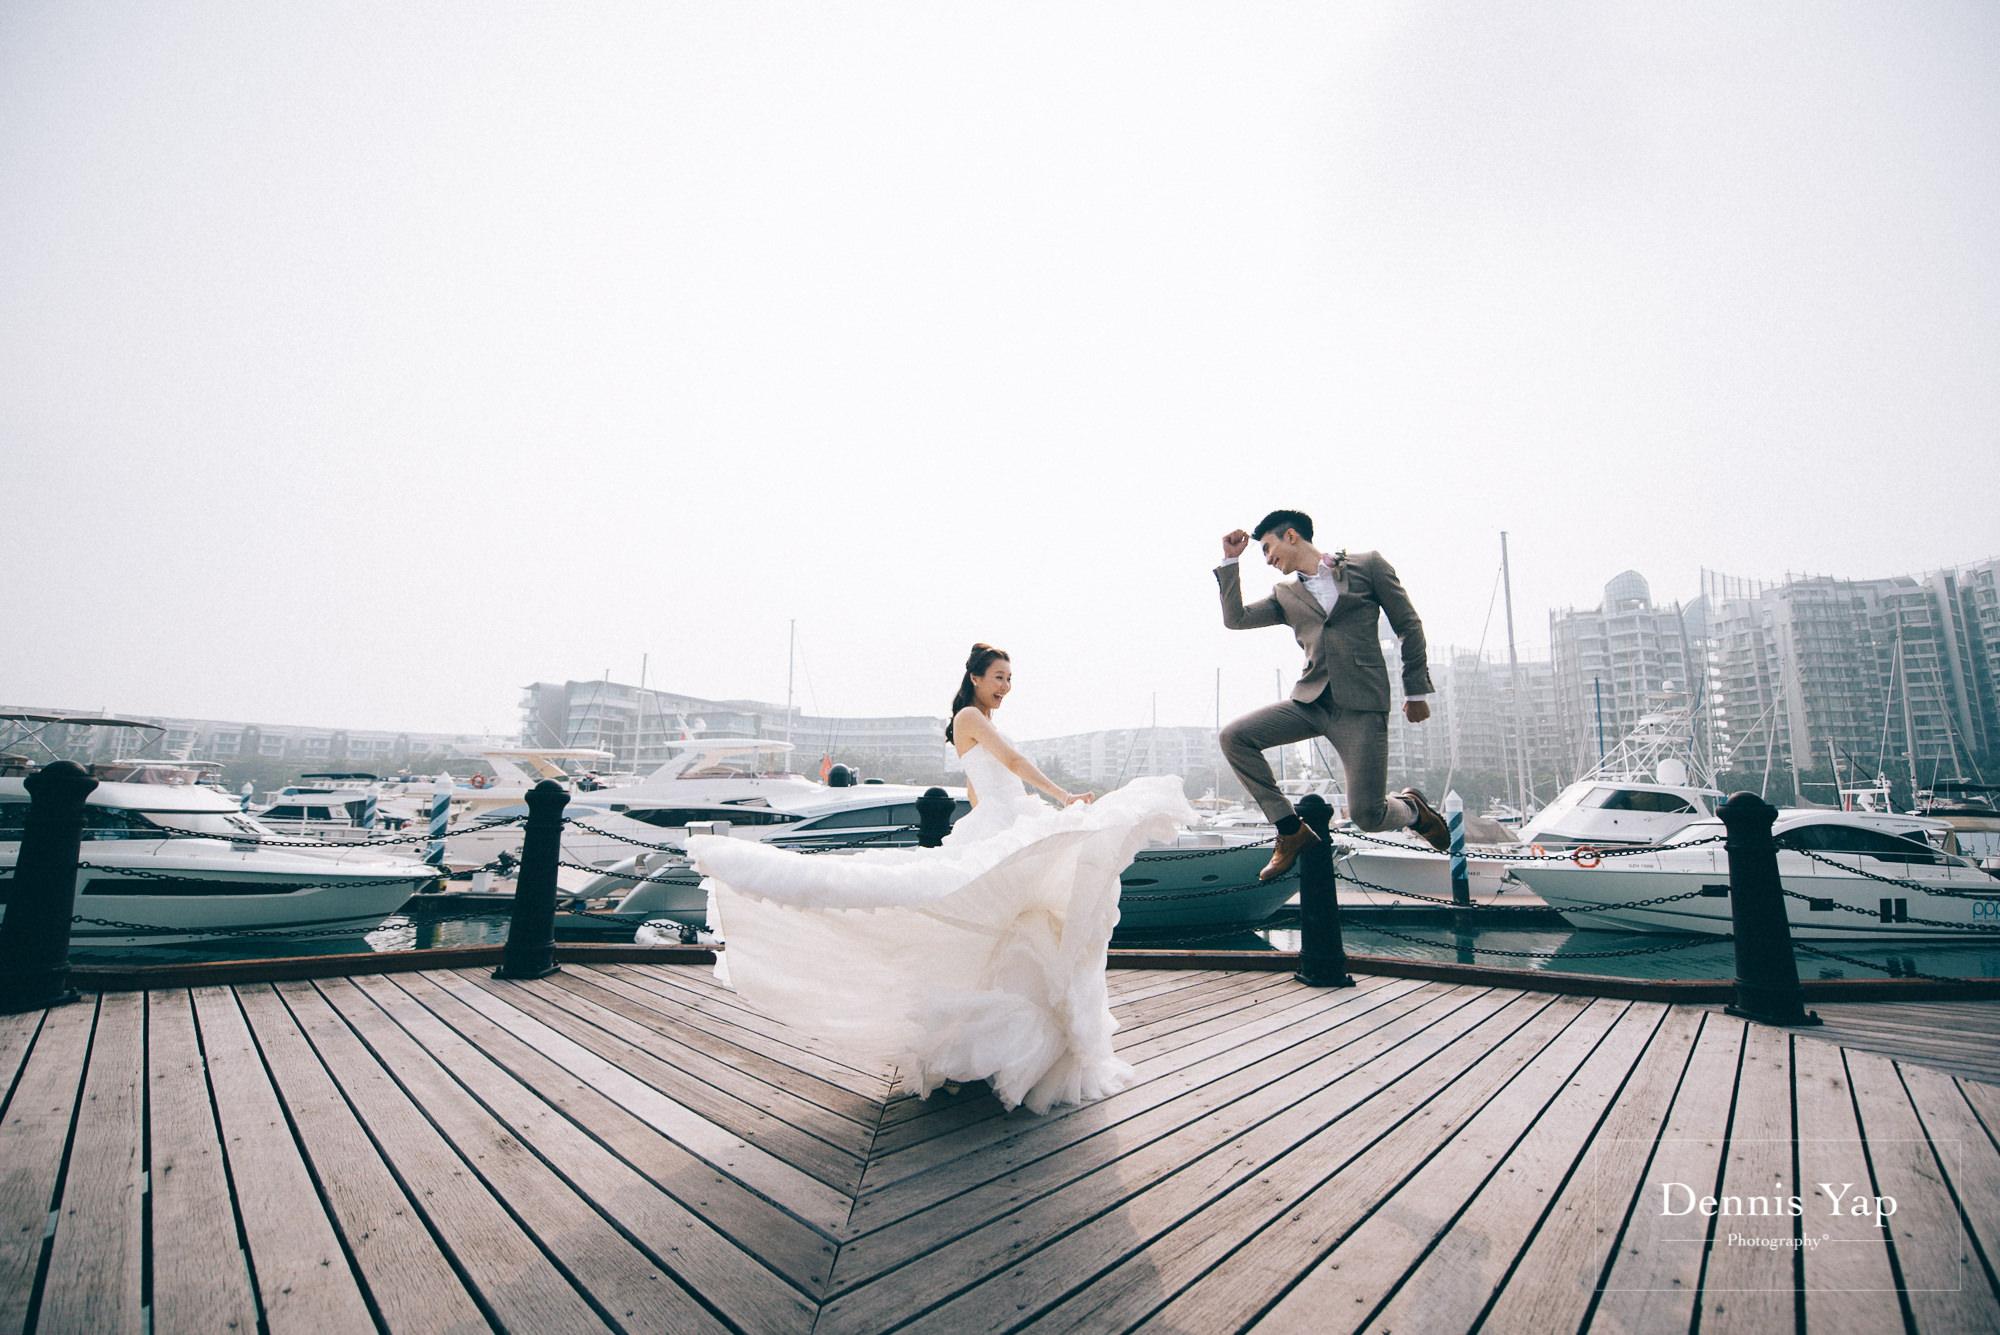 danny sherine wedding reception registration of marriage yacht fun beloved sea dennis yap photography malaysia top wedding photographer-4.jpg